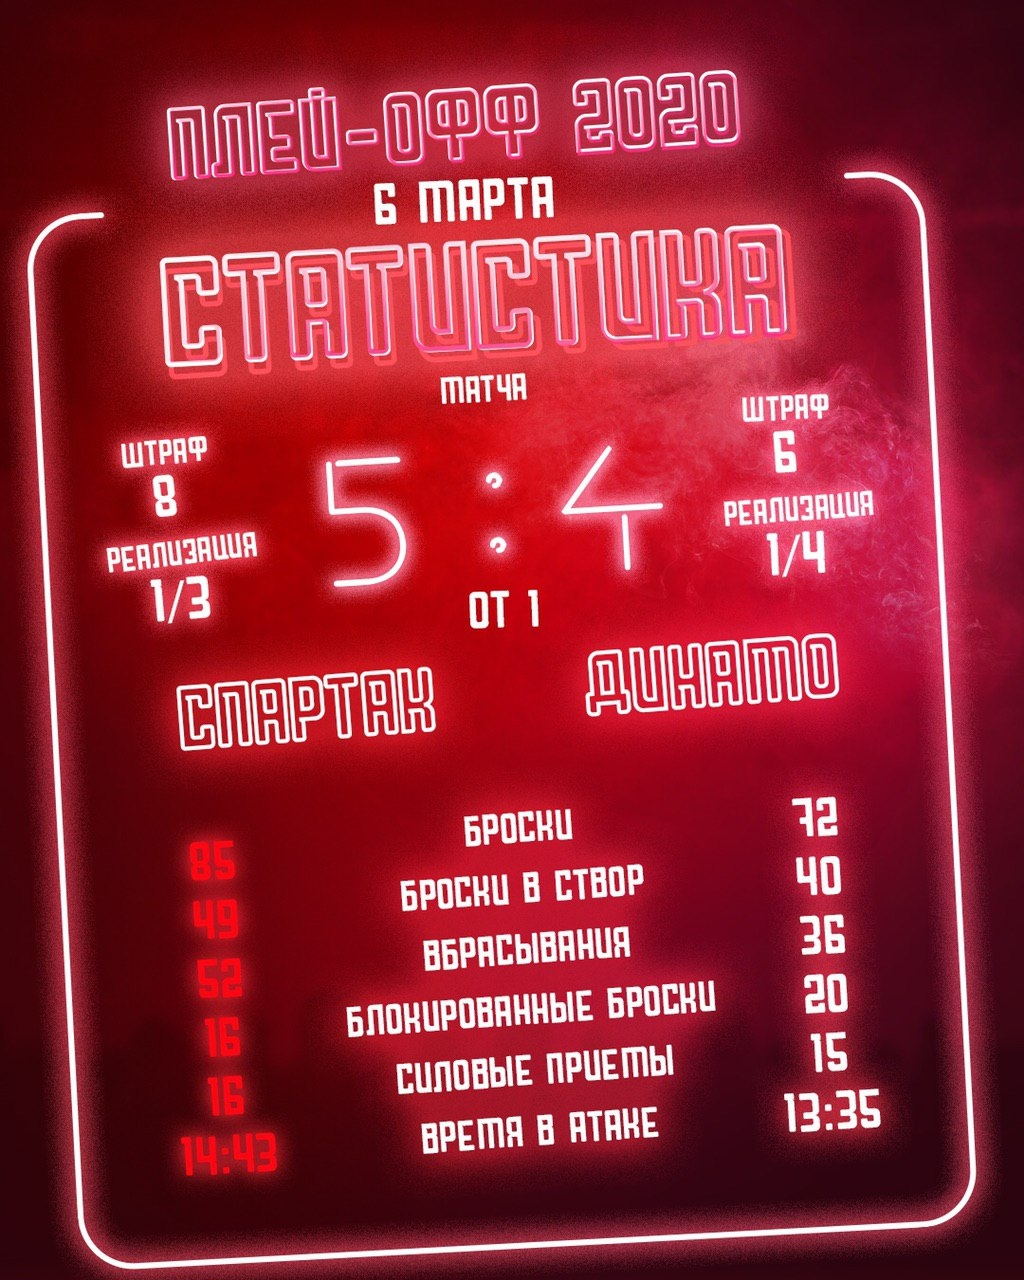 Статистика матча «Спартак» - «Динамо» 5:4 ОТ